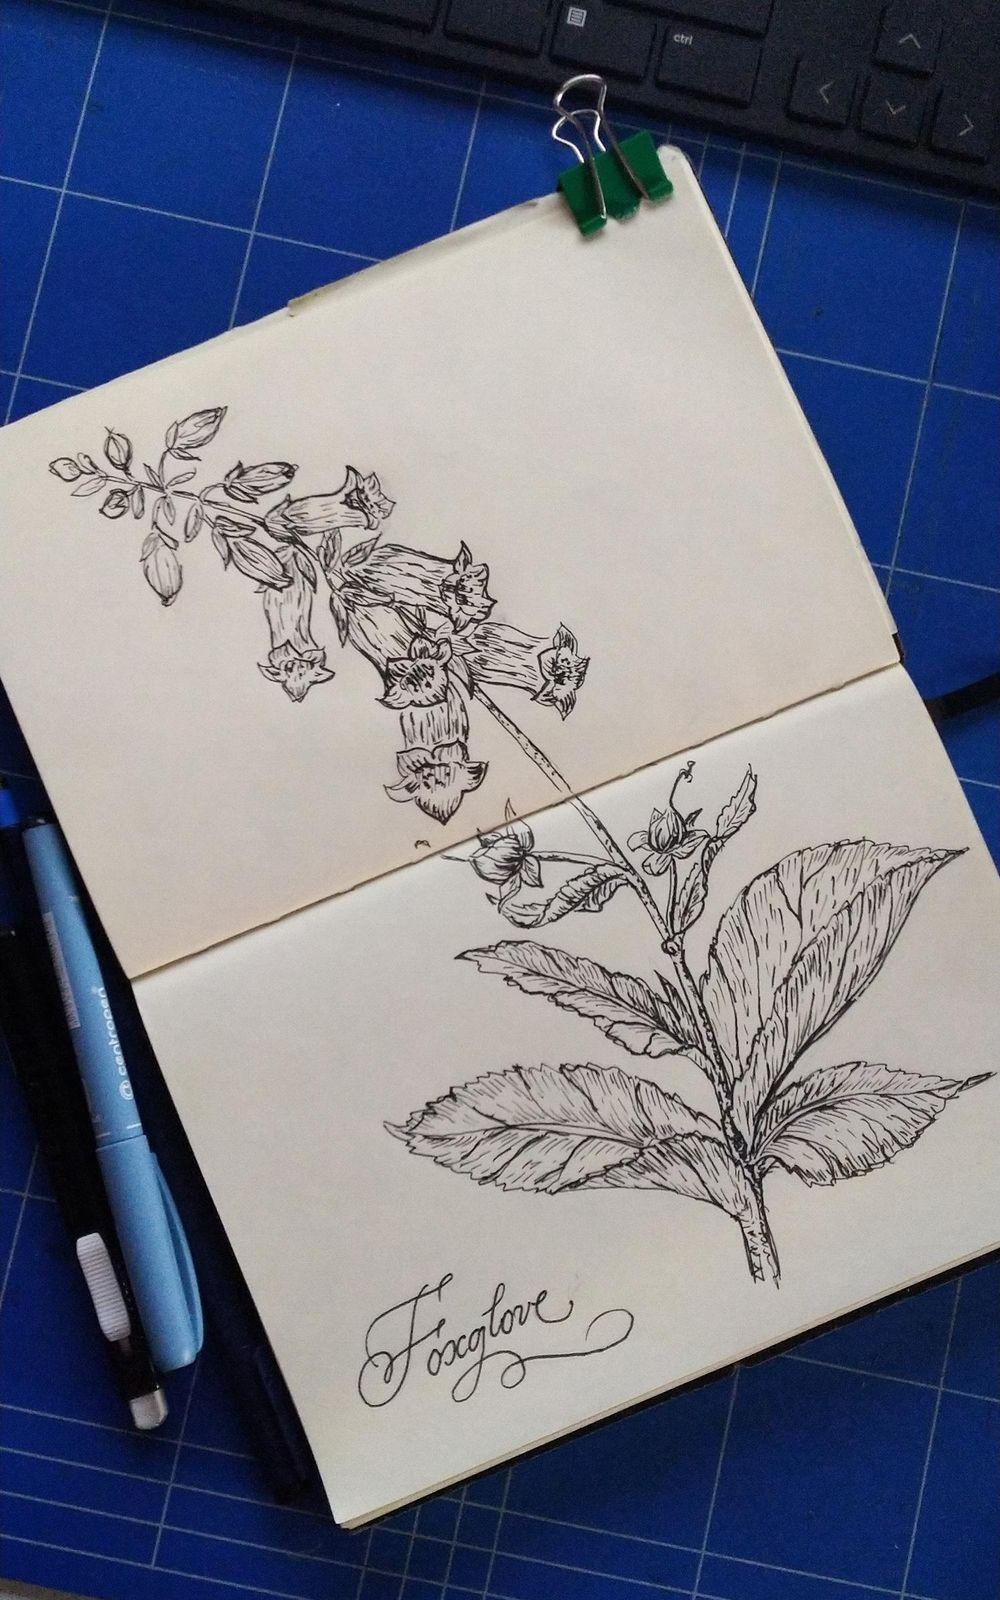 Poisonous Plants Line Drawing - image 3 - student project